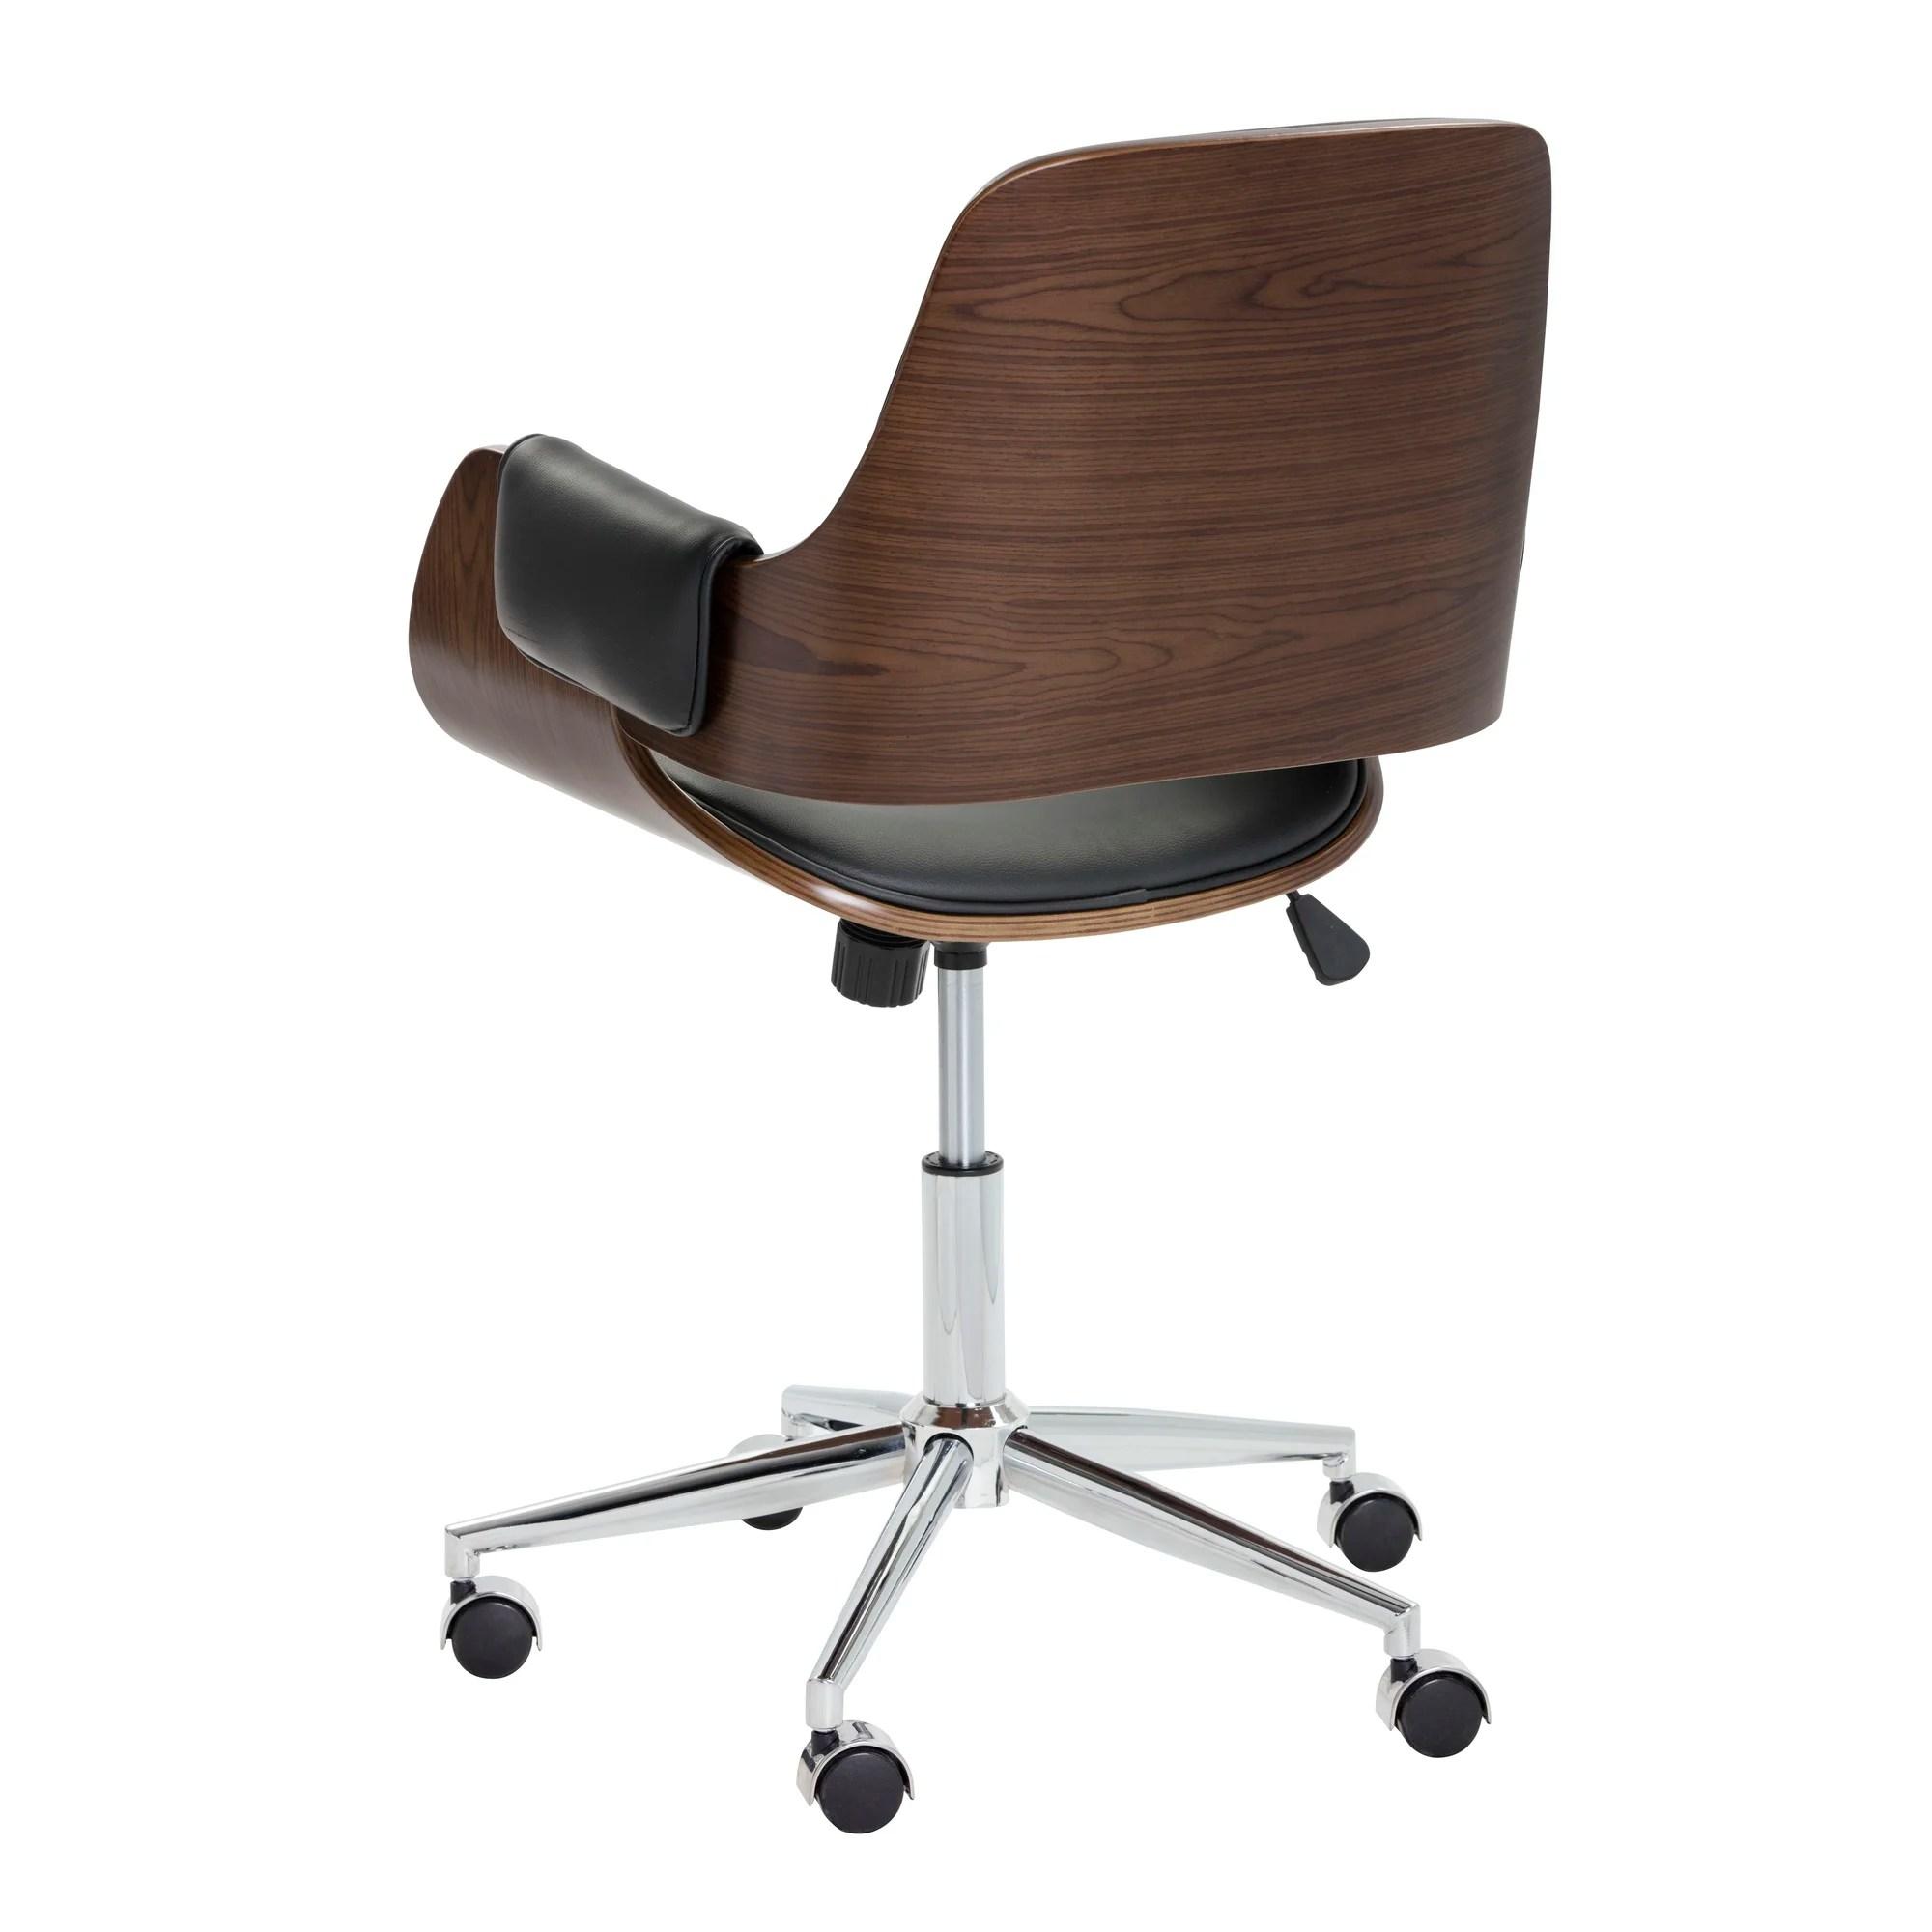 desk chair is too low grey covers ireland sunpan modern kellan back and reviews